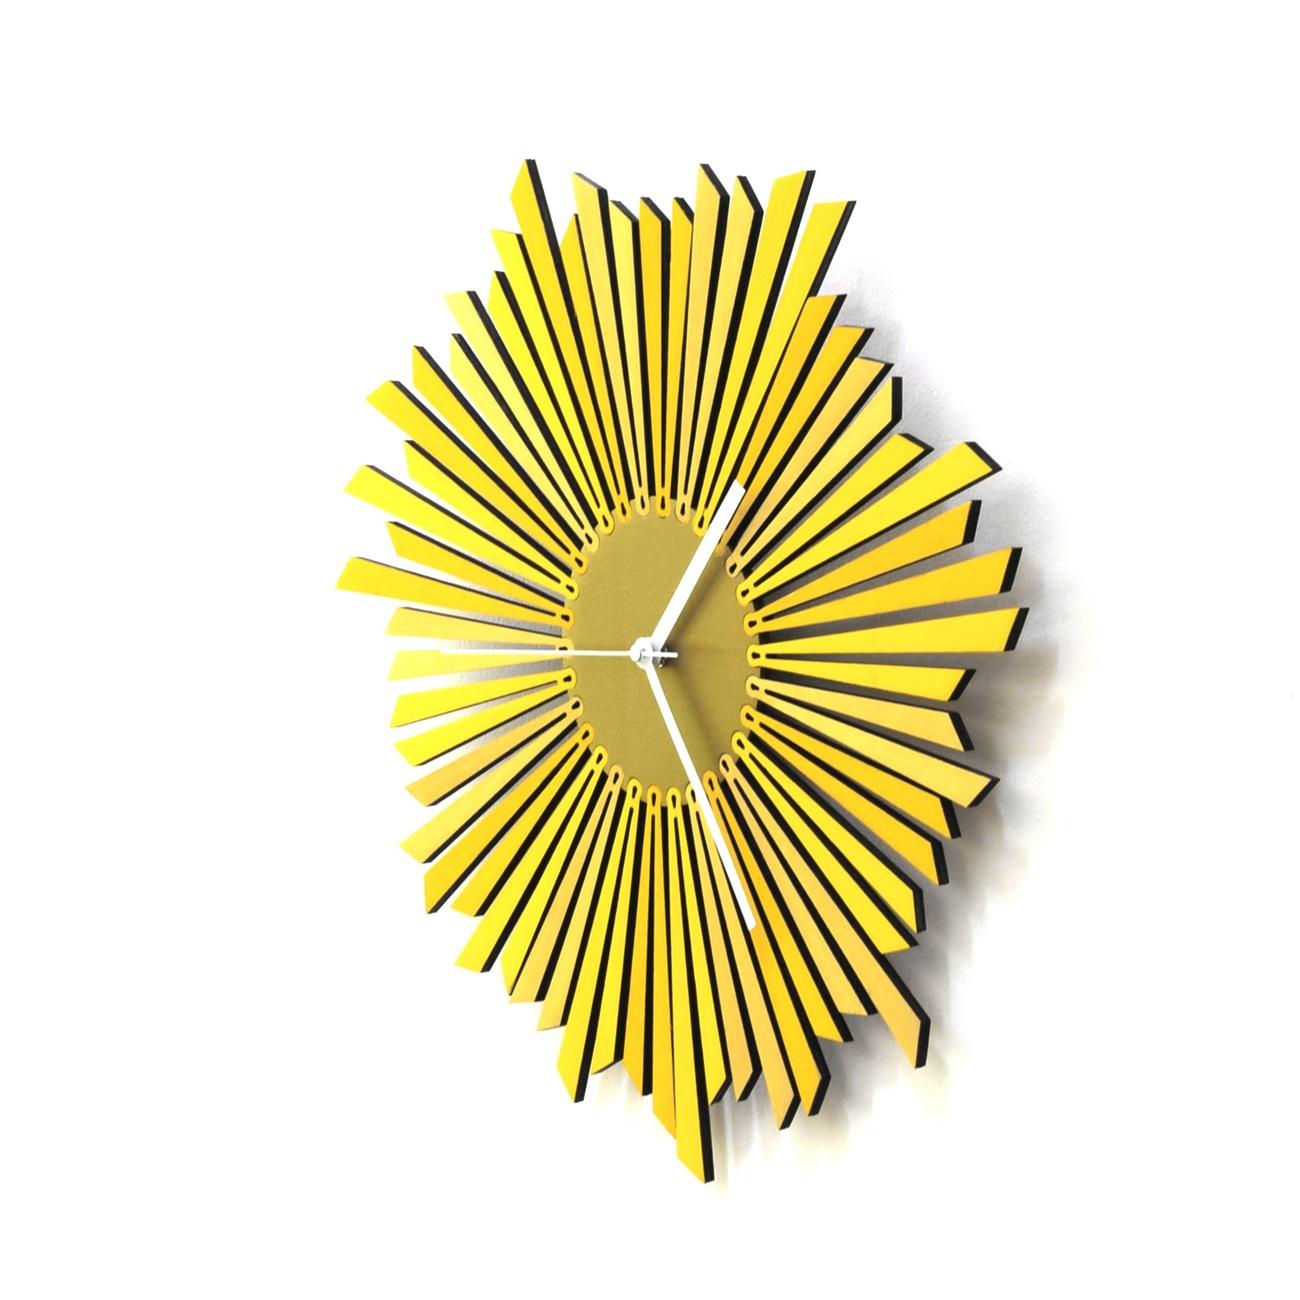 The Sun – Stylish Yellow / Golden Wooden Wall Clock